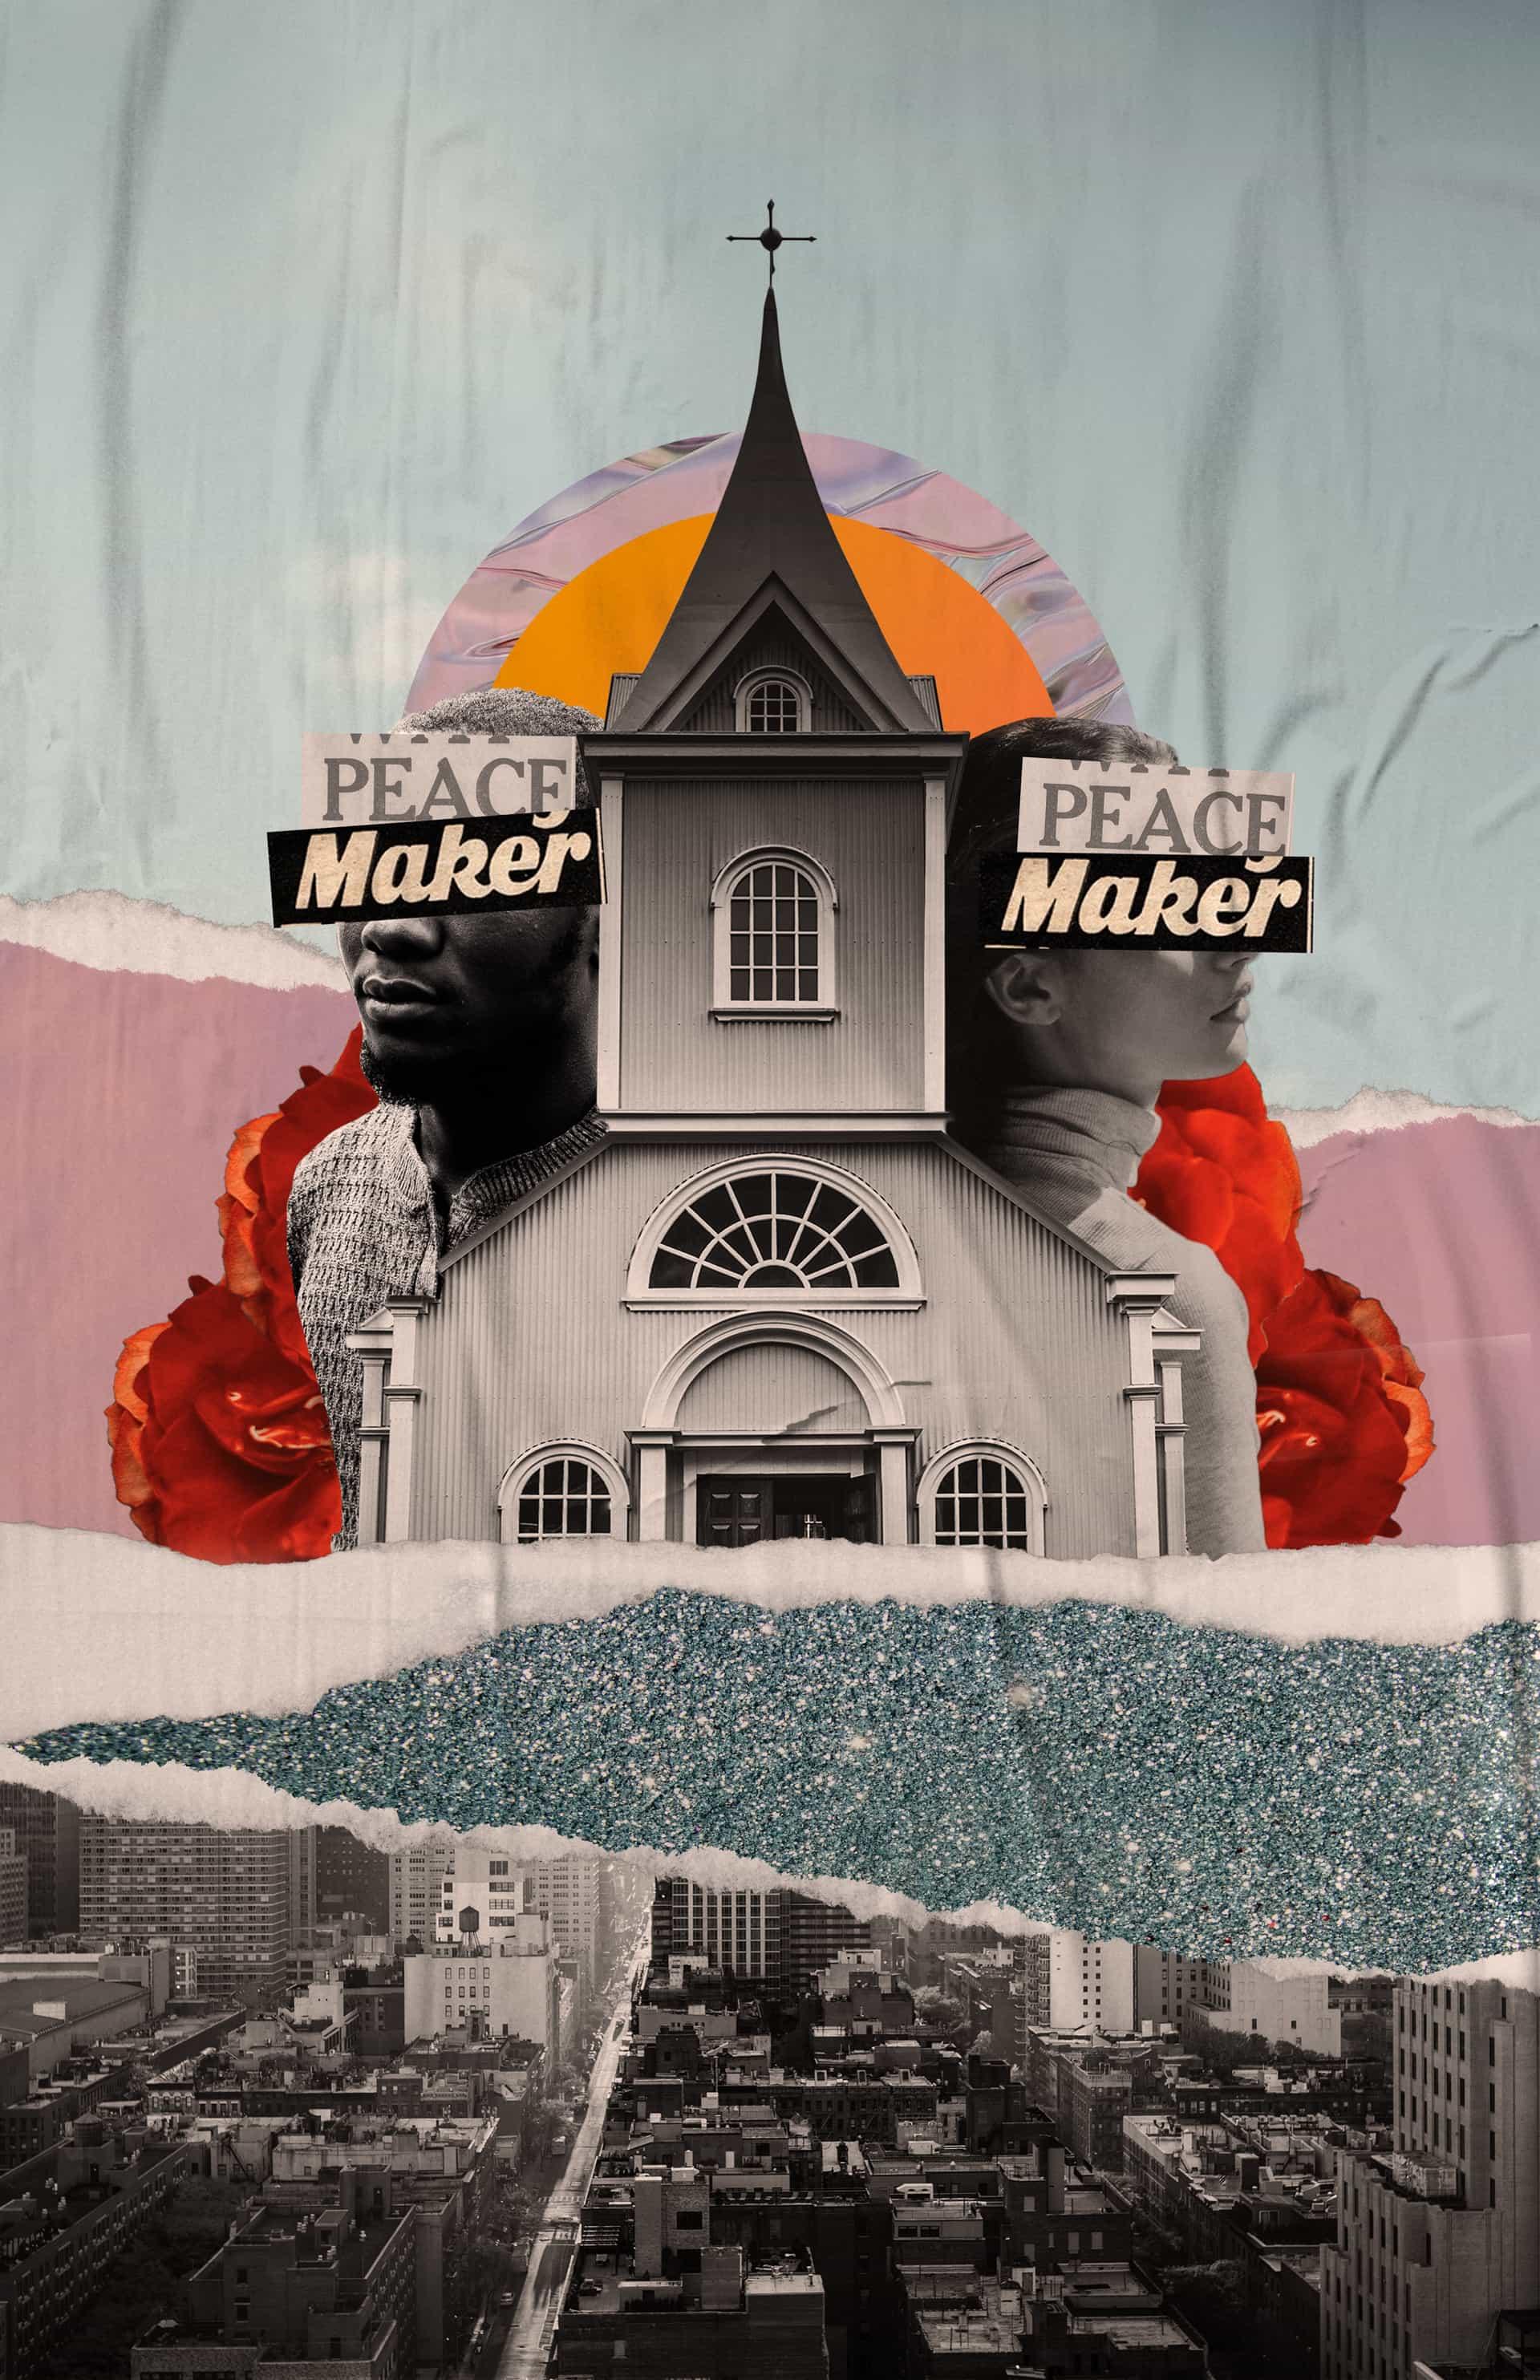 StoryArc Editorial Image. Designed by